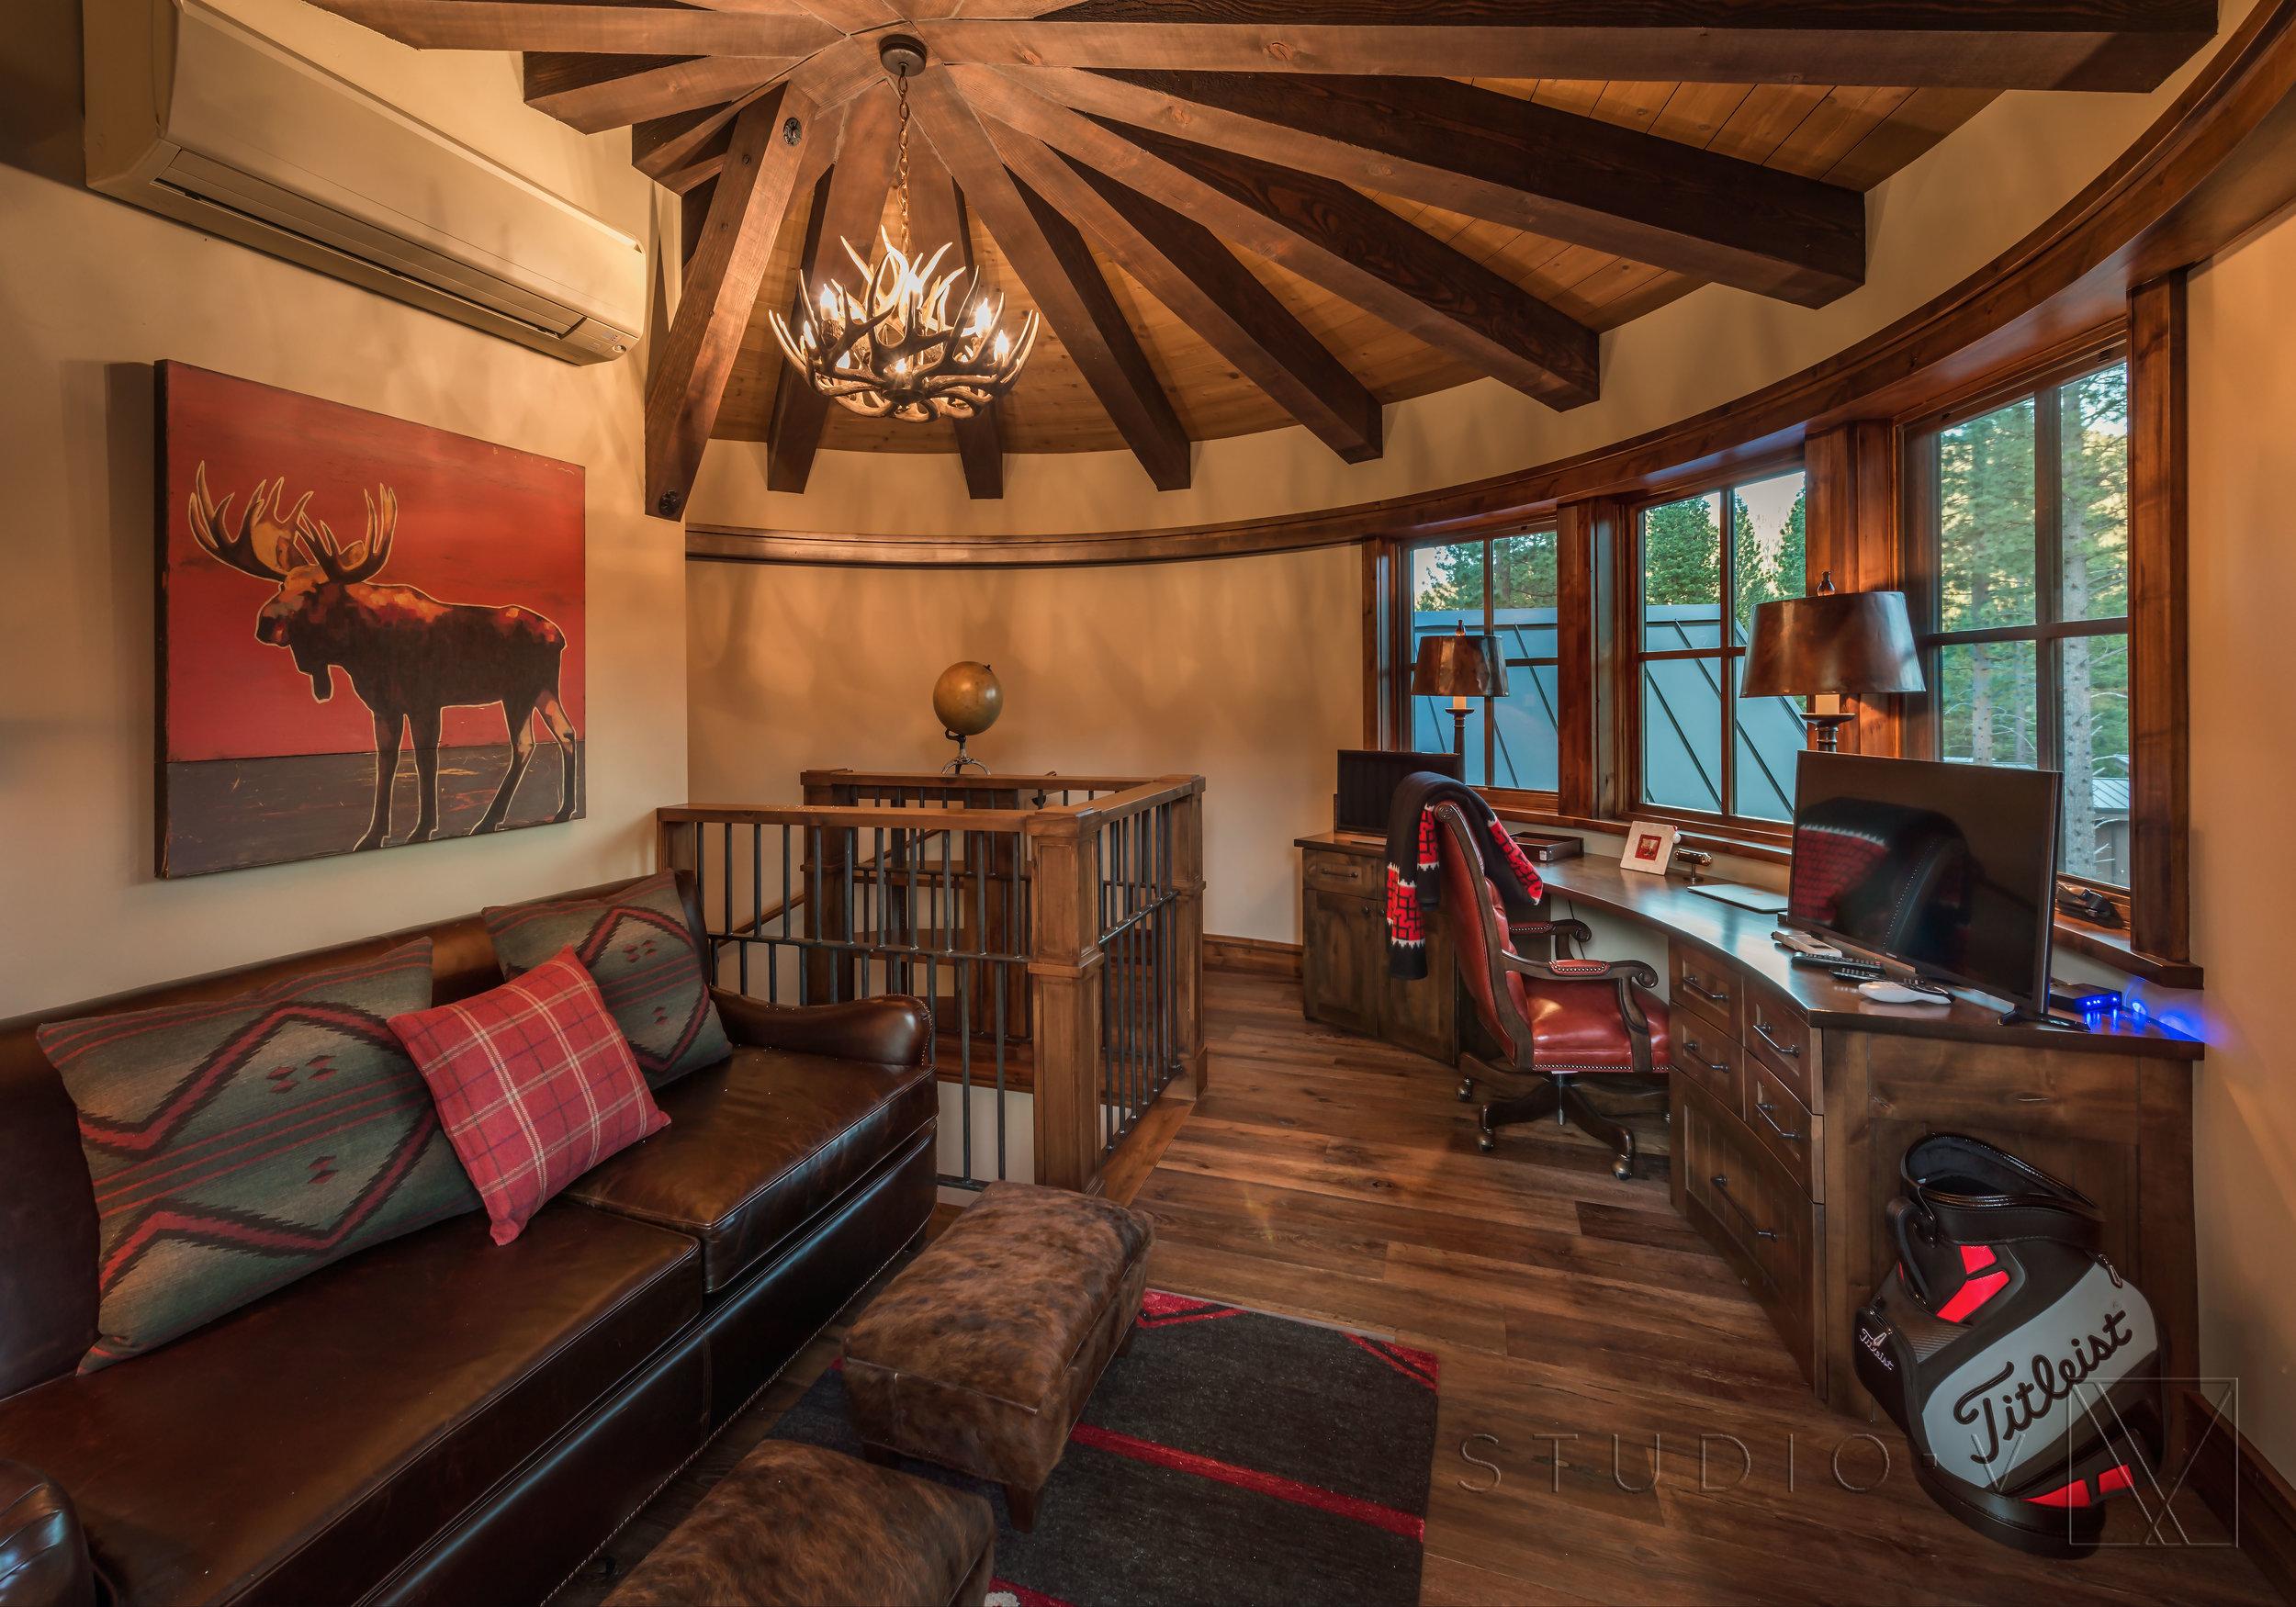 Lodge Cabin Tahoe Truckee Martis Camp CA California Traditional Studio V Interior Architecture Design Scottsdale Arizona AZ (29).jpg